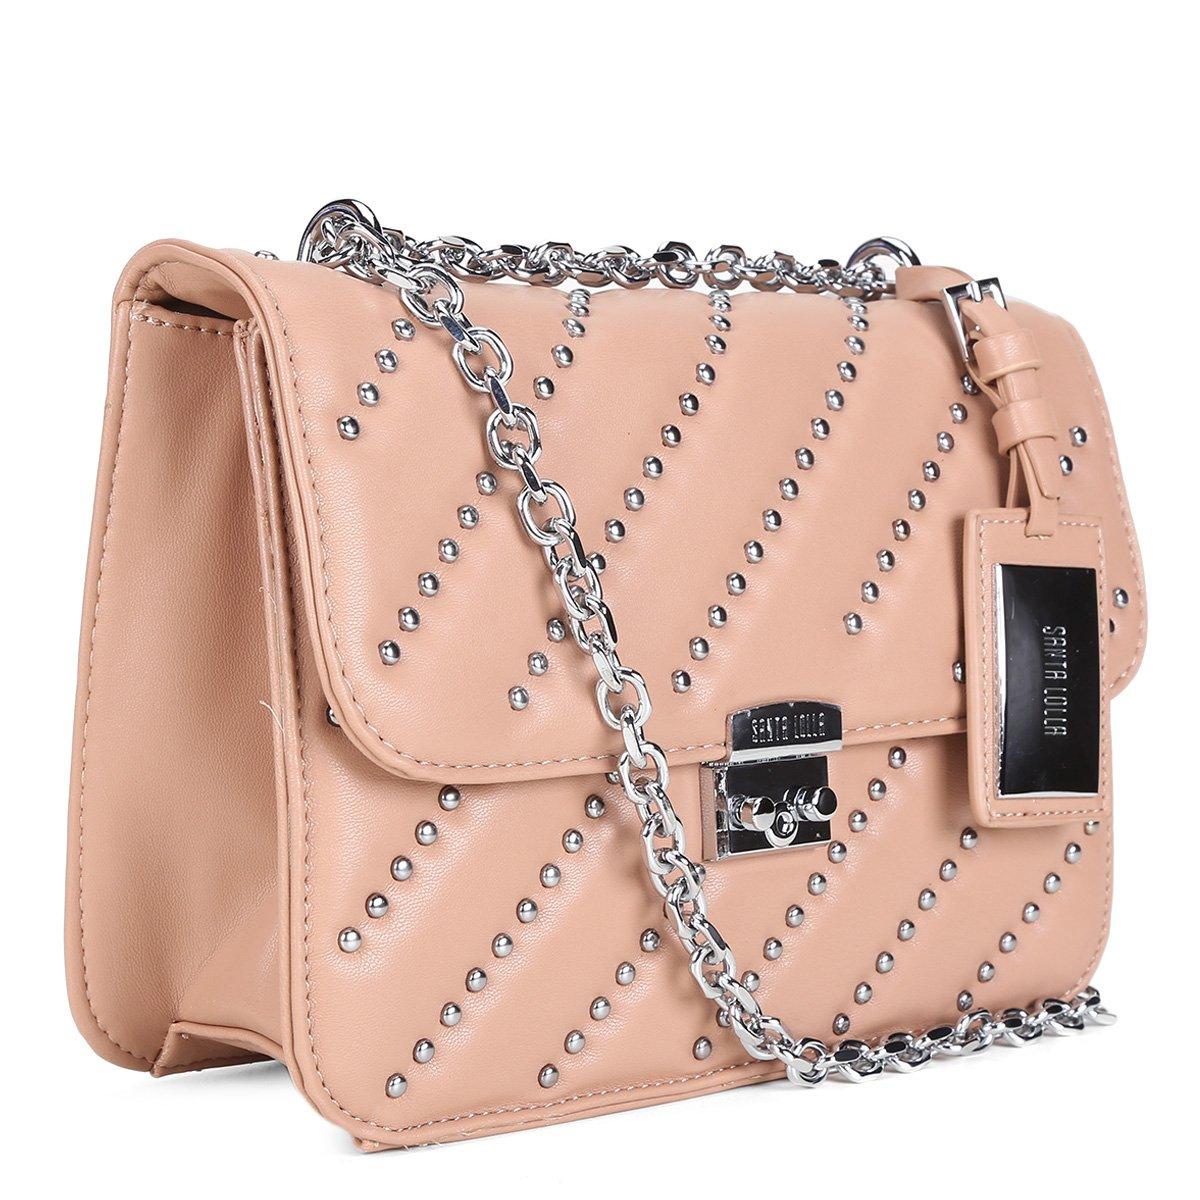 0e6576147422a Bolsa Santa Lolla Flap Apliques Feminina - Compre Agora   Zattini